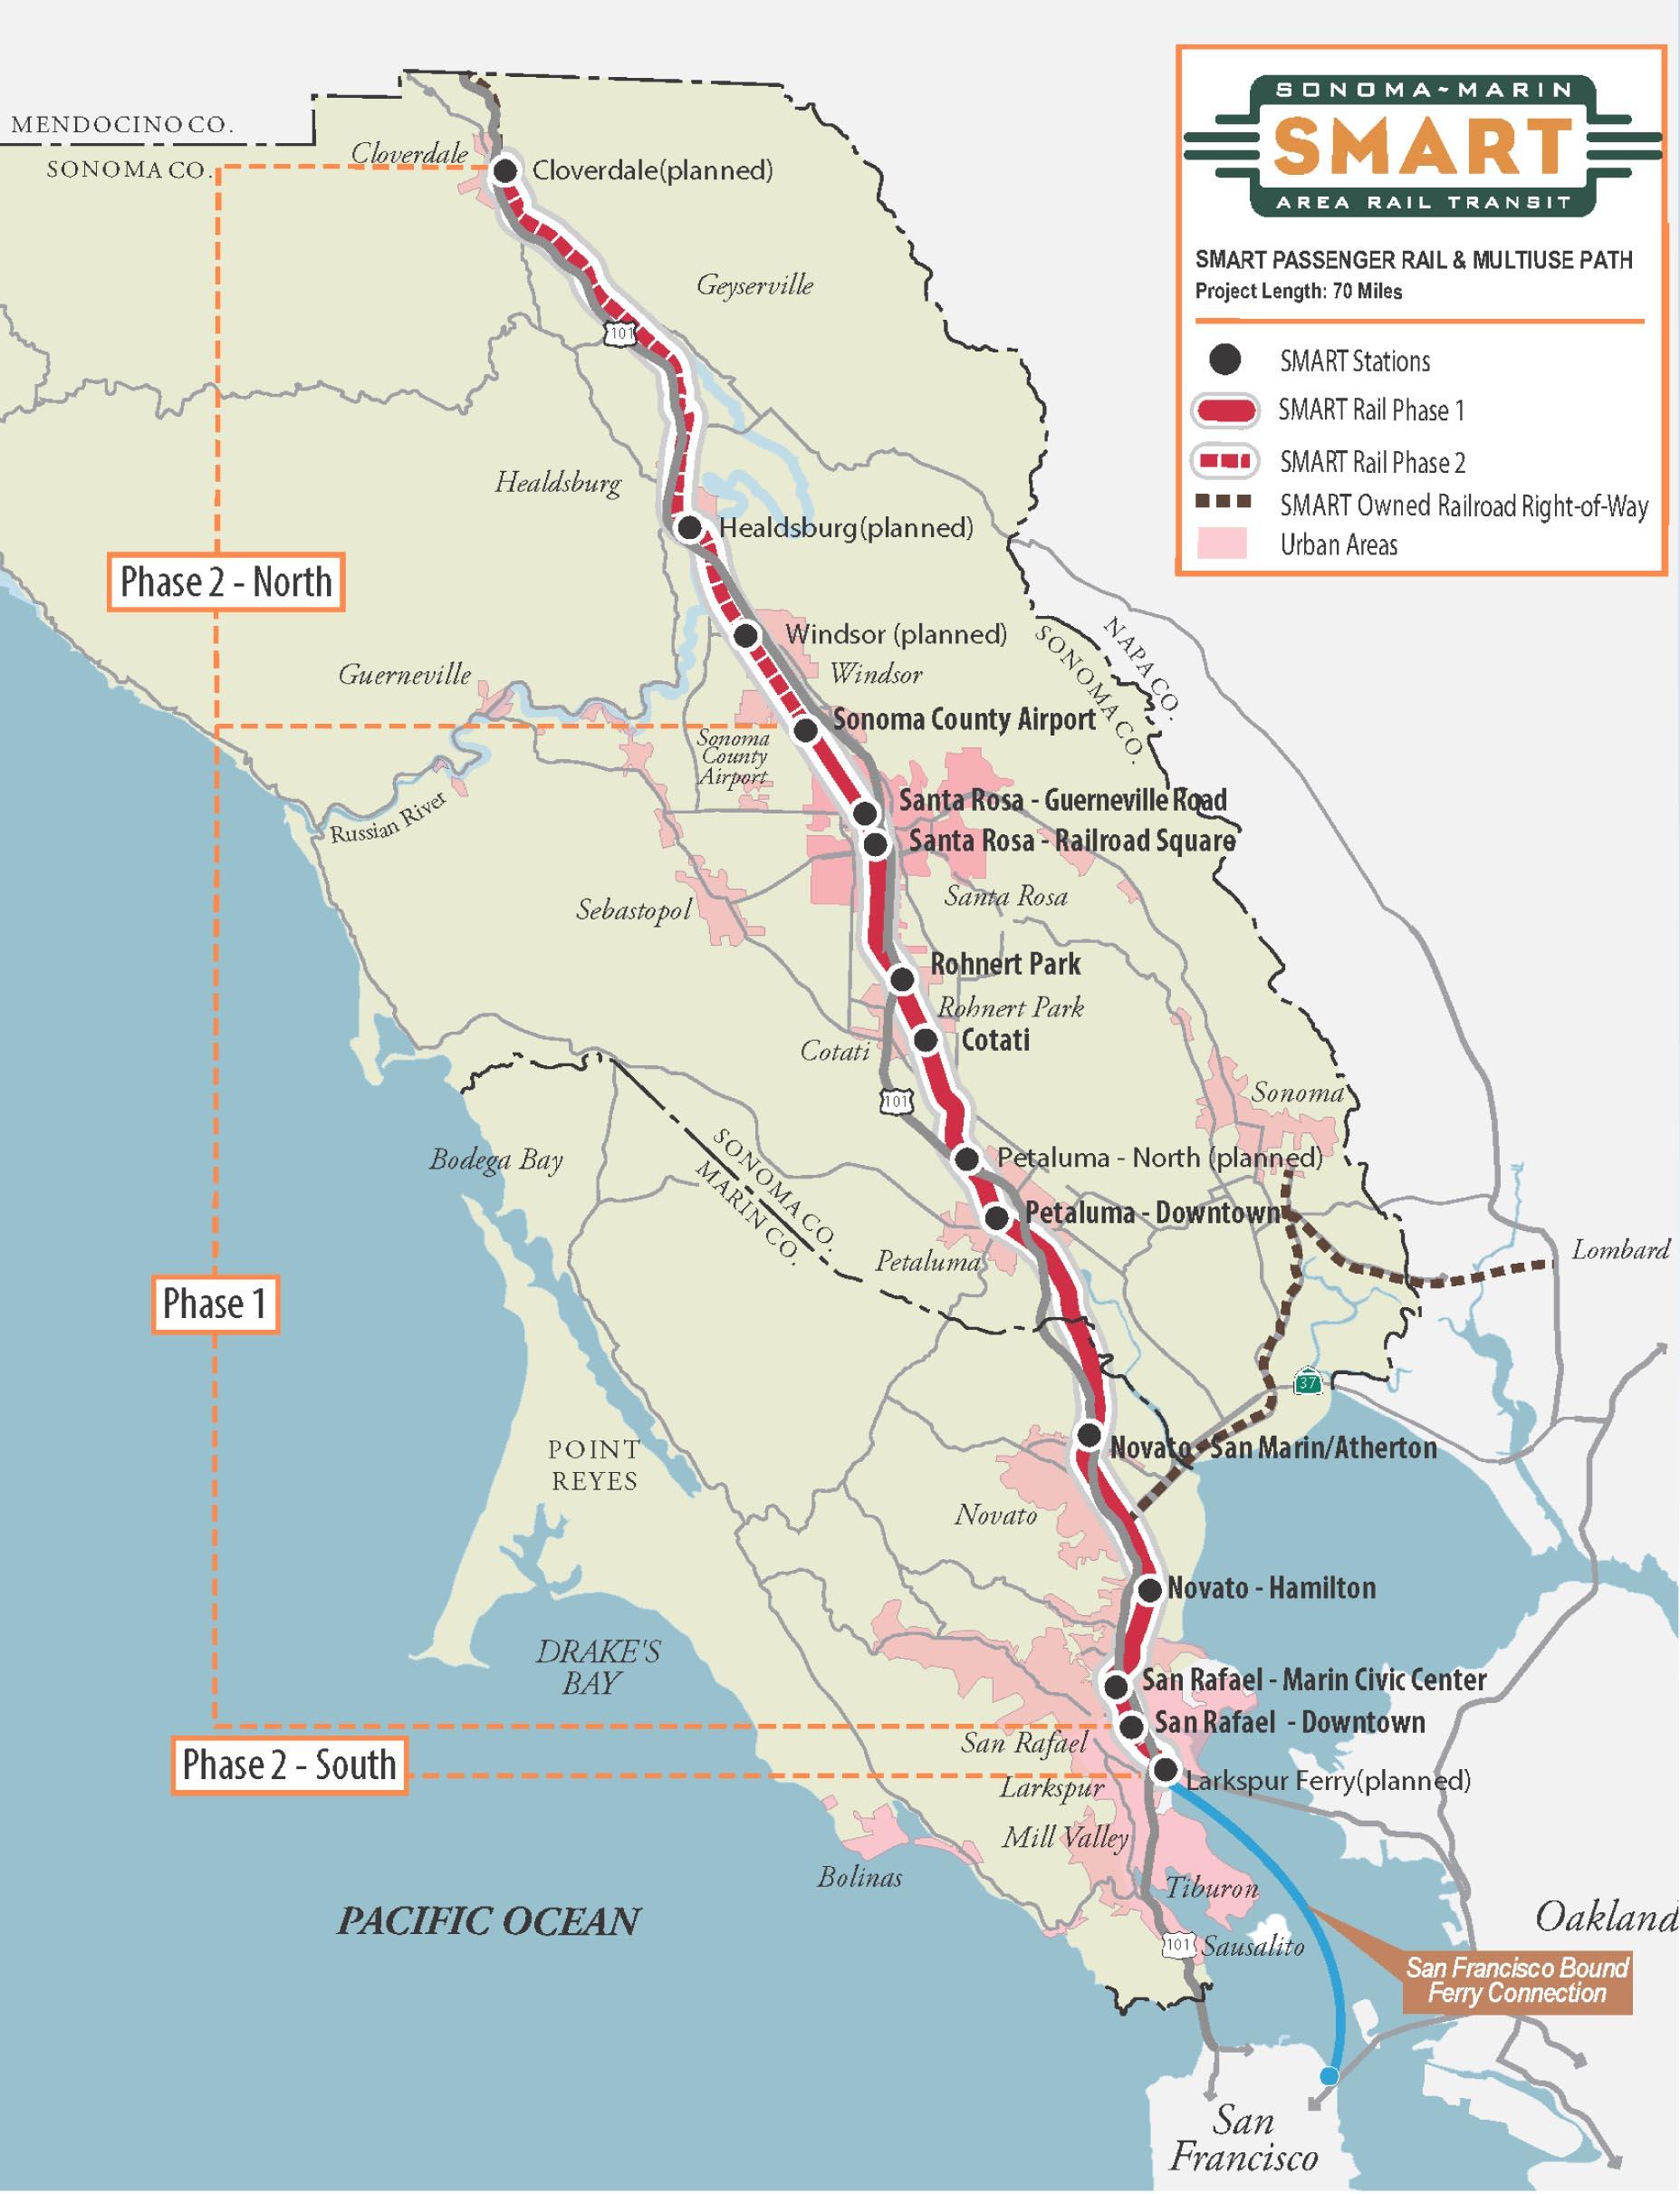 Image from Sonoma Marin Area Rail Transit (SMART)